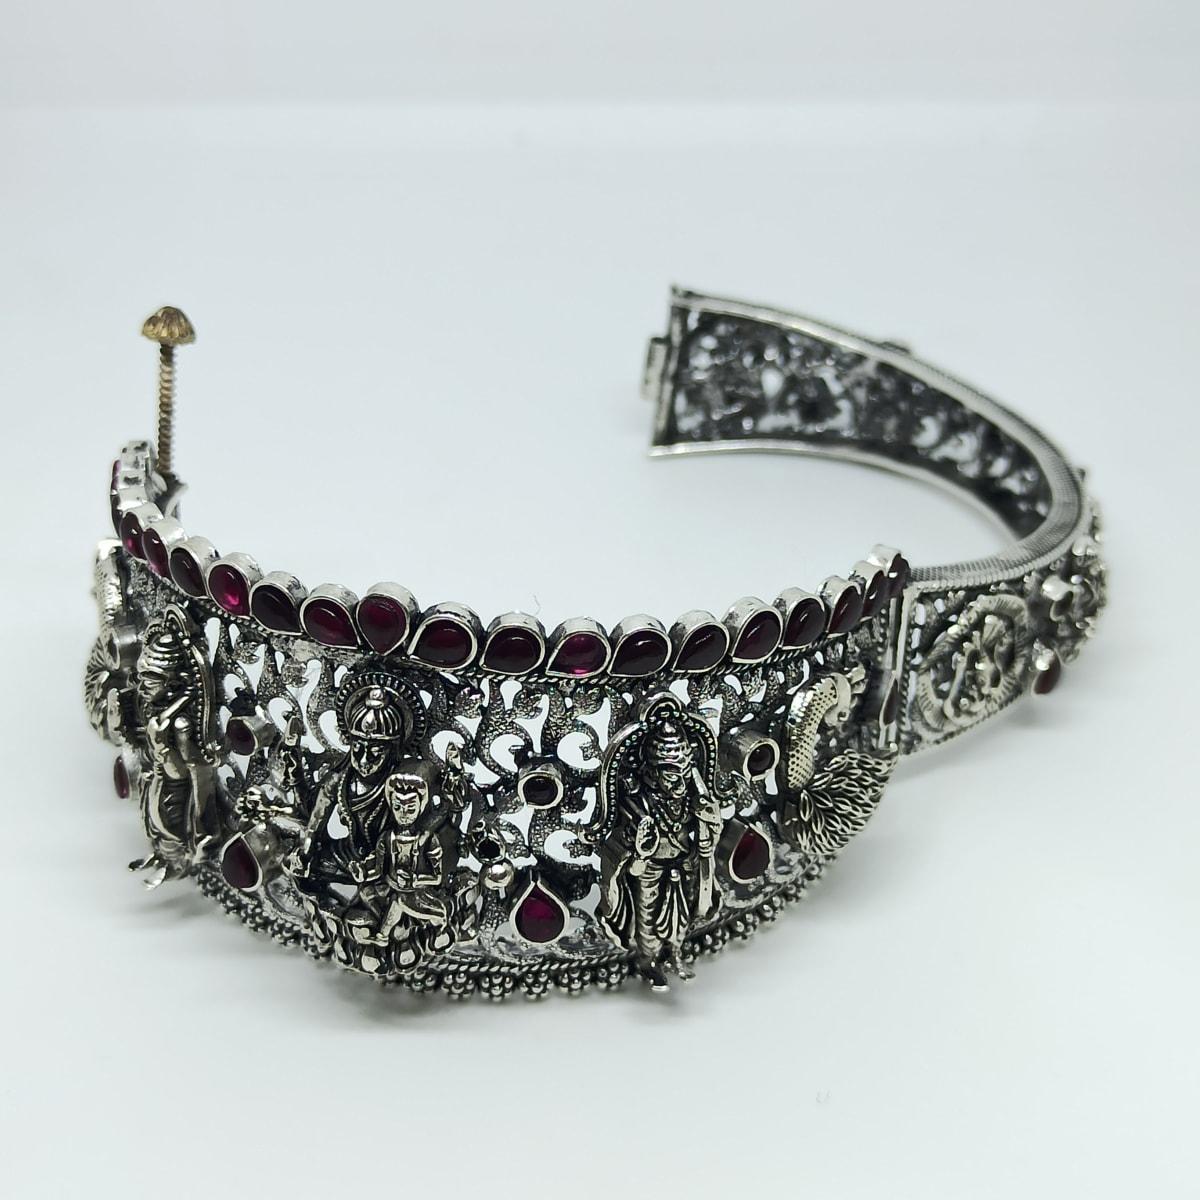 Sri Lakshmi Antique Silver Kada